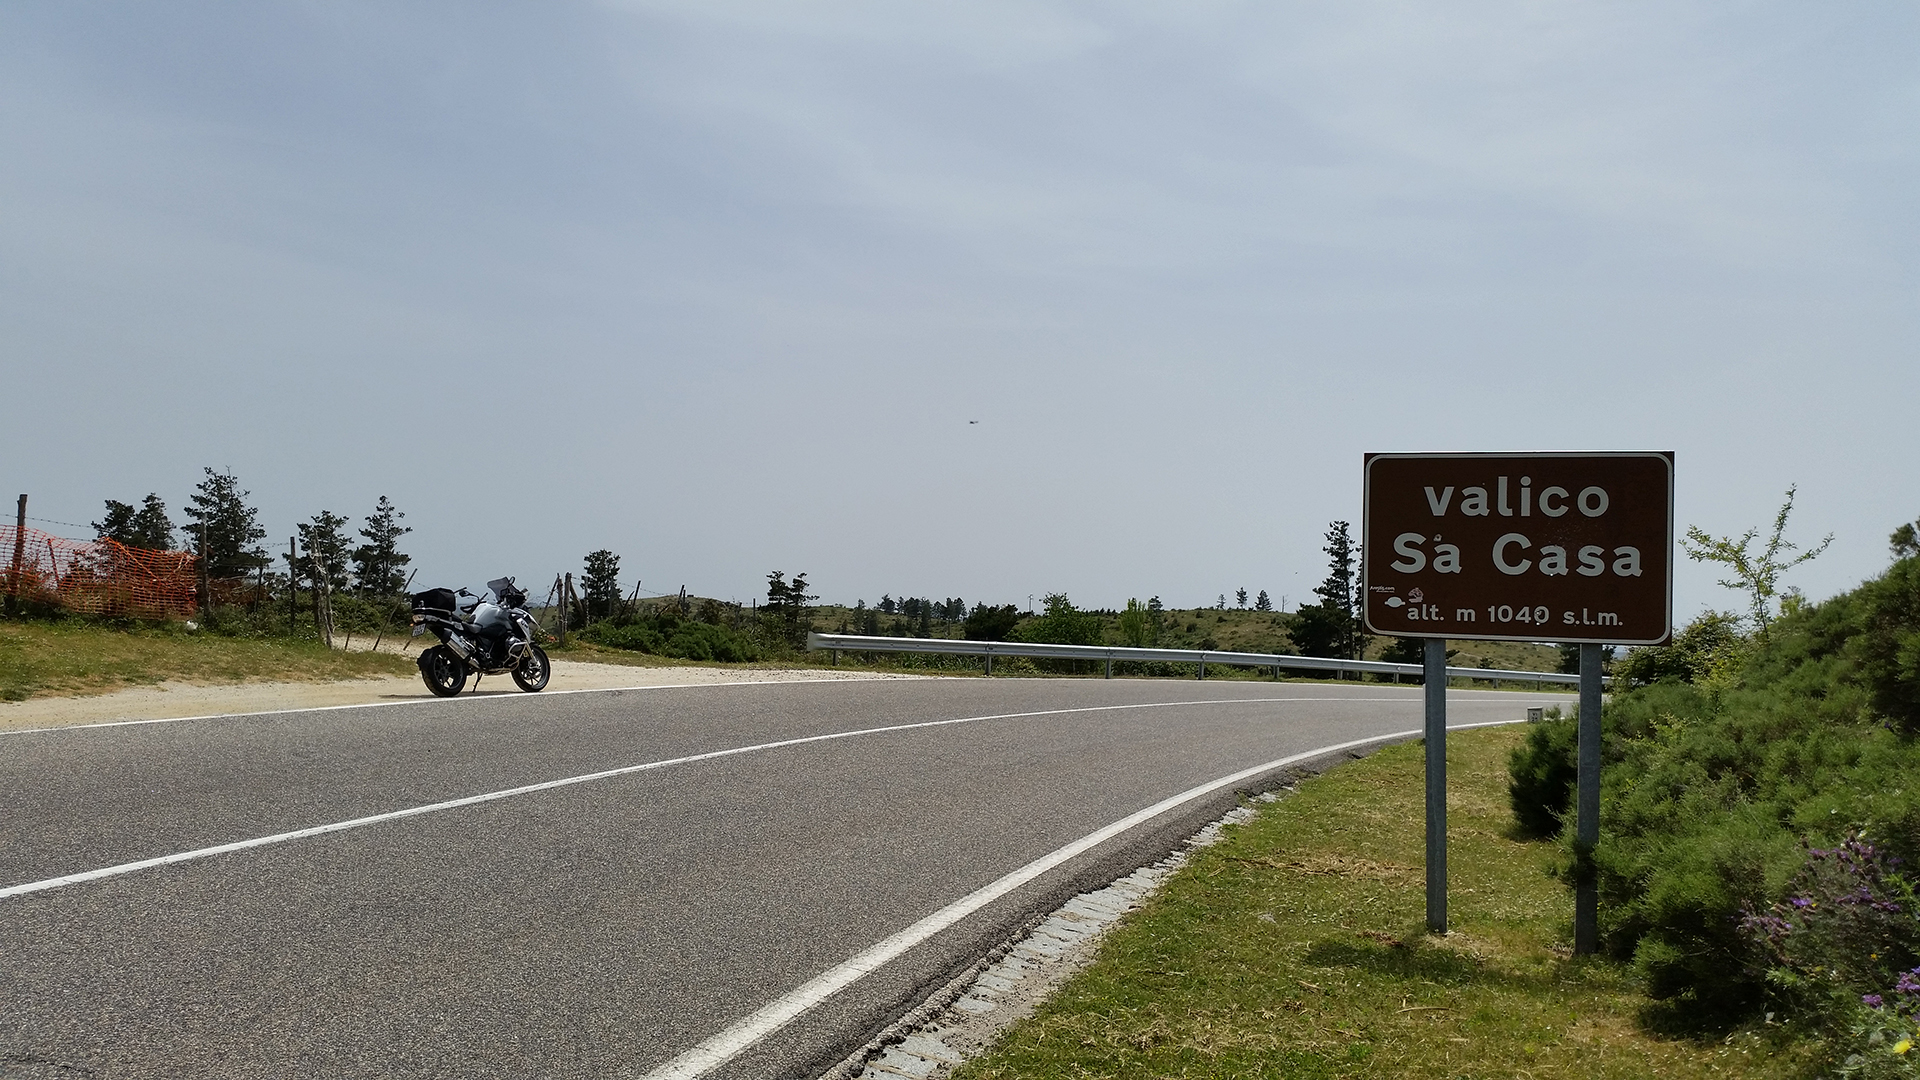 1040 - I (Sardegna) - Valico sa Casa